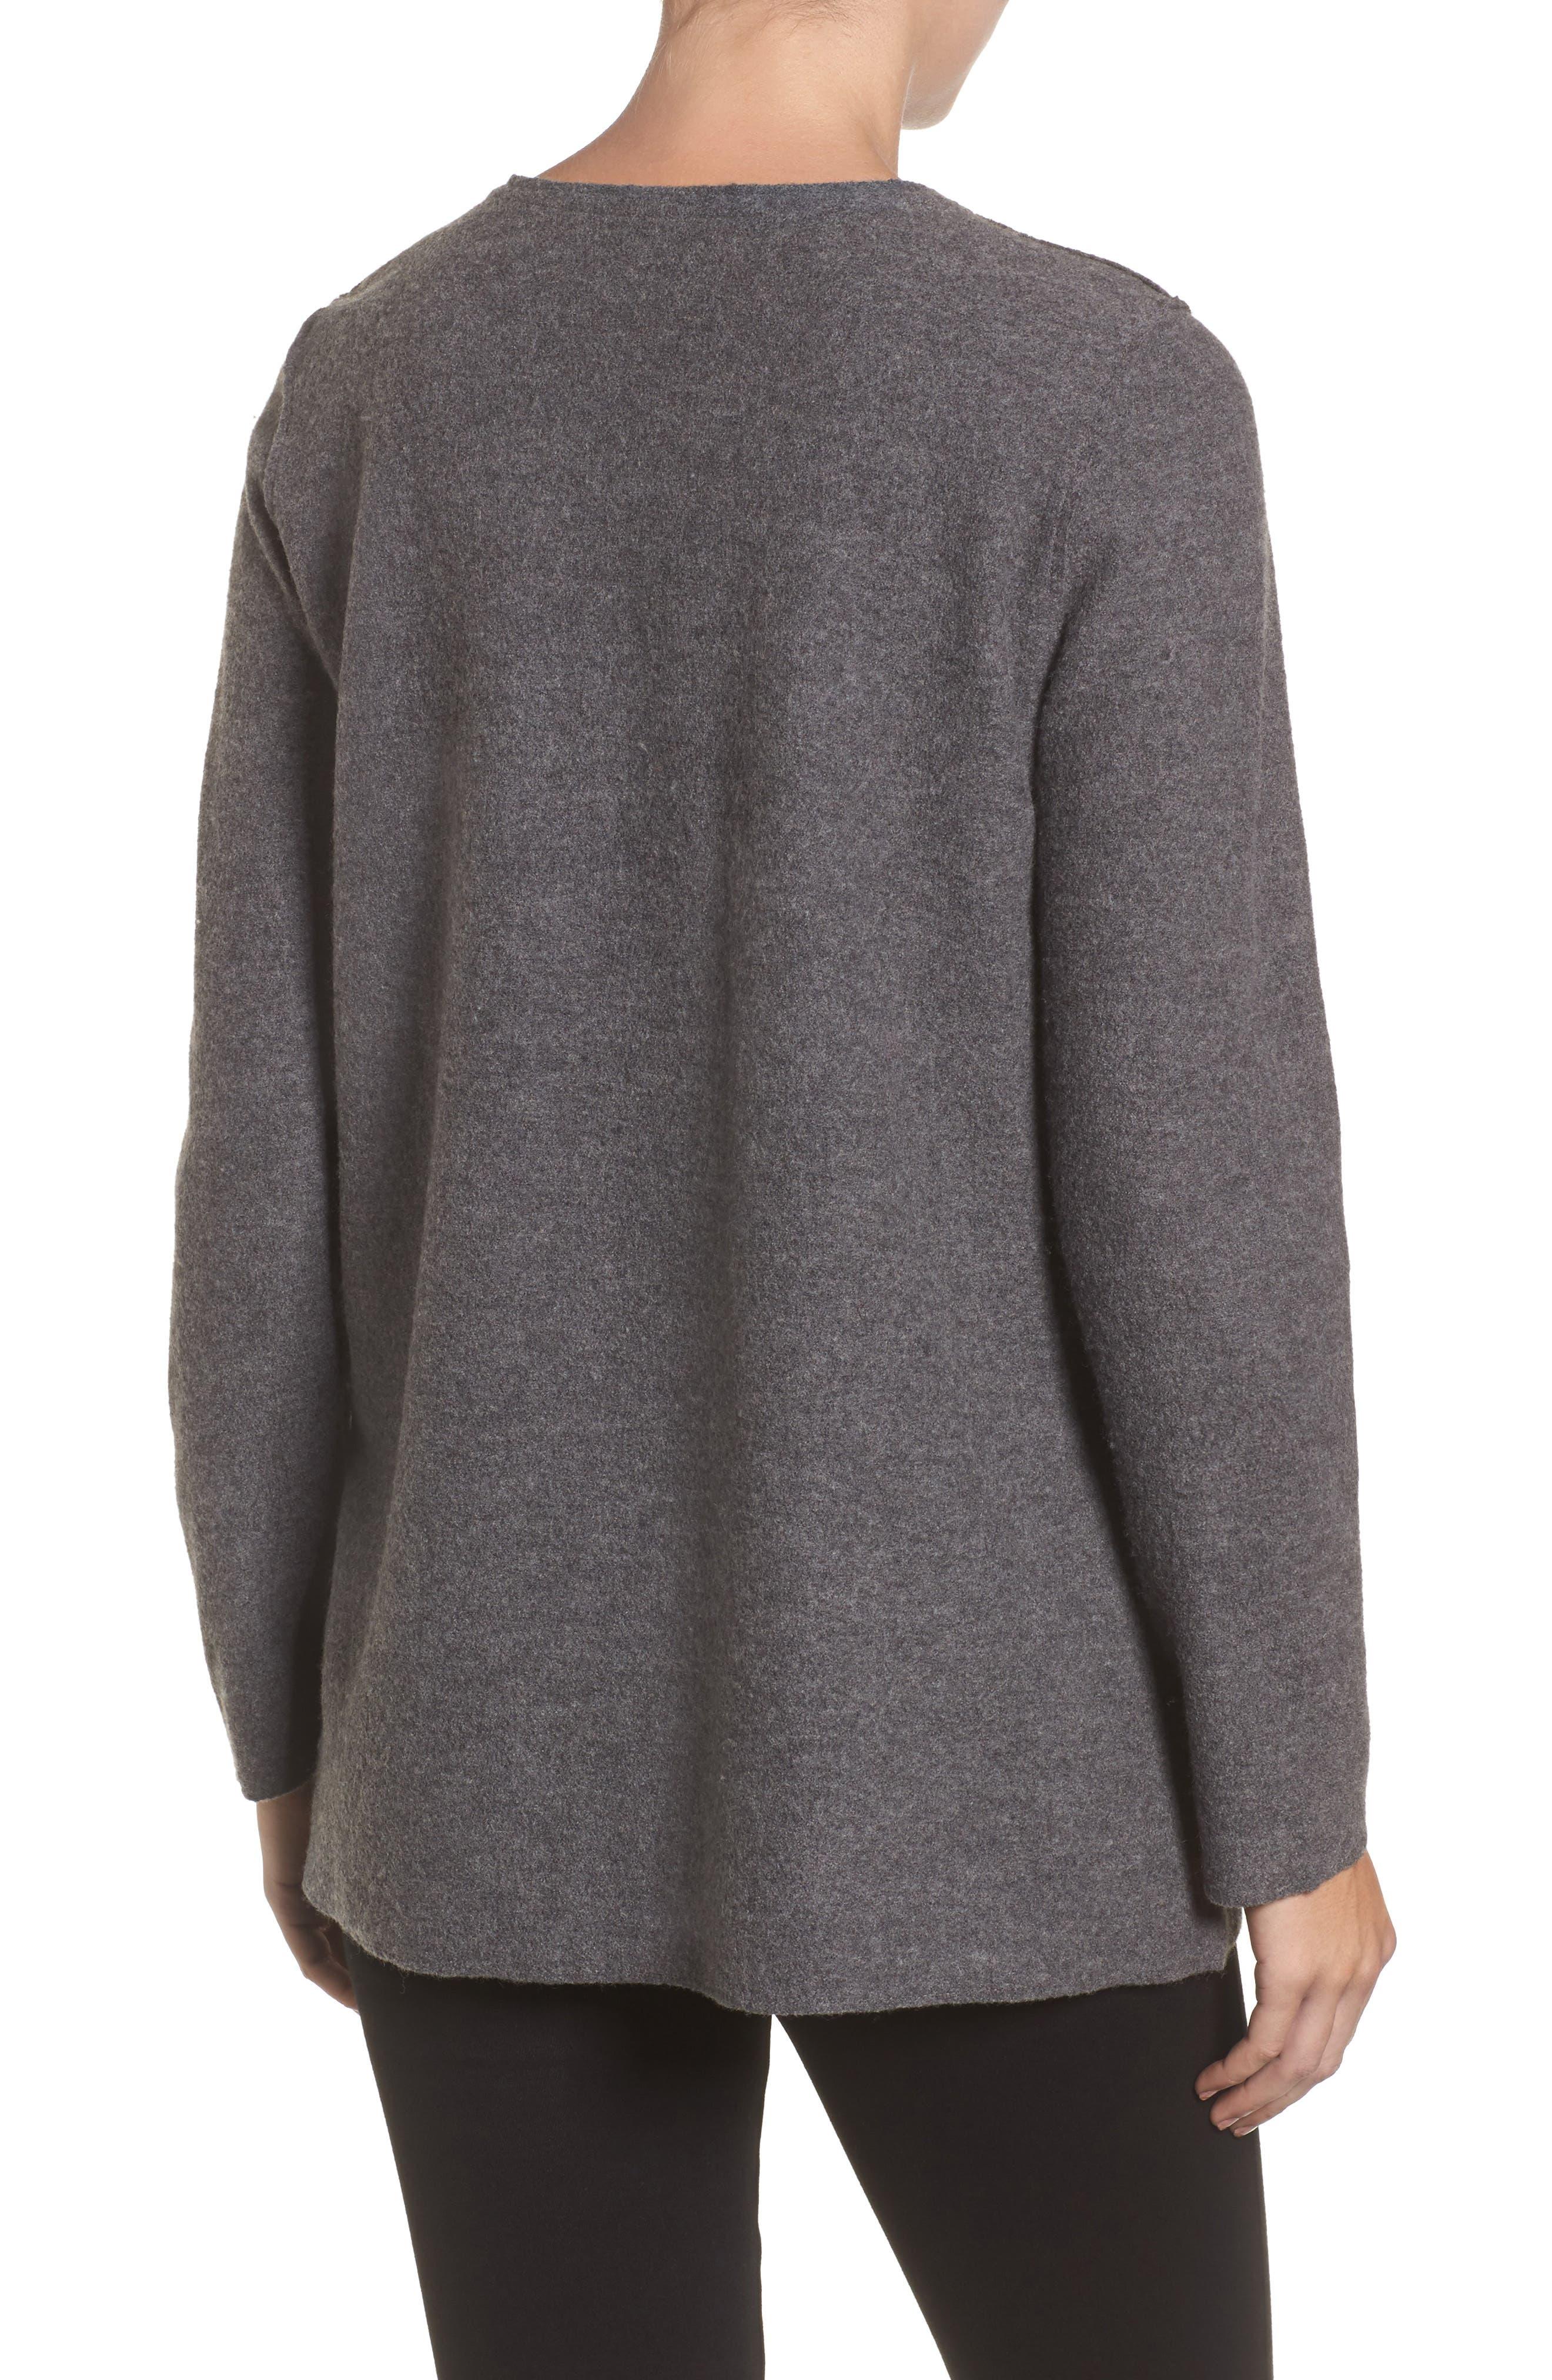 Alternate Image 2  - Eileen Fisher Boiled Merino Wool Top (Regular & Petite)